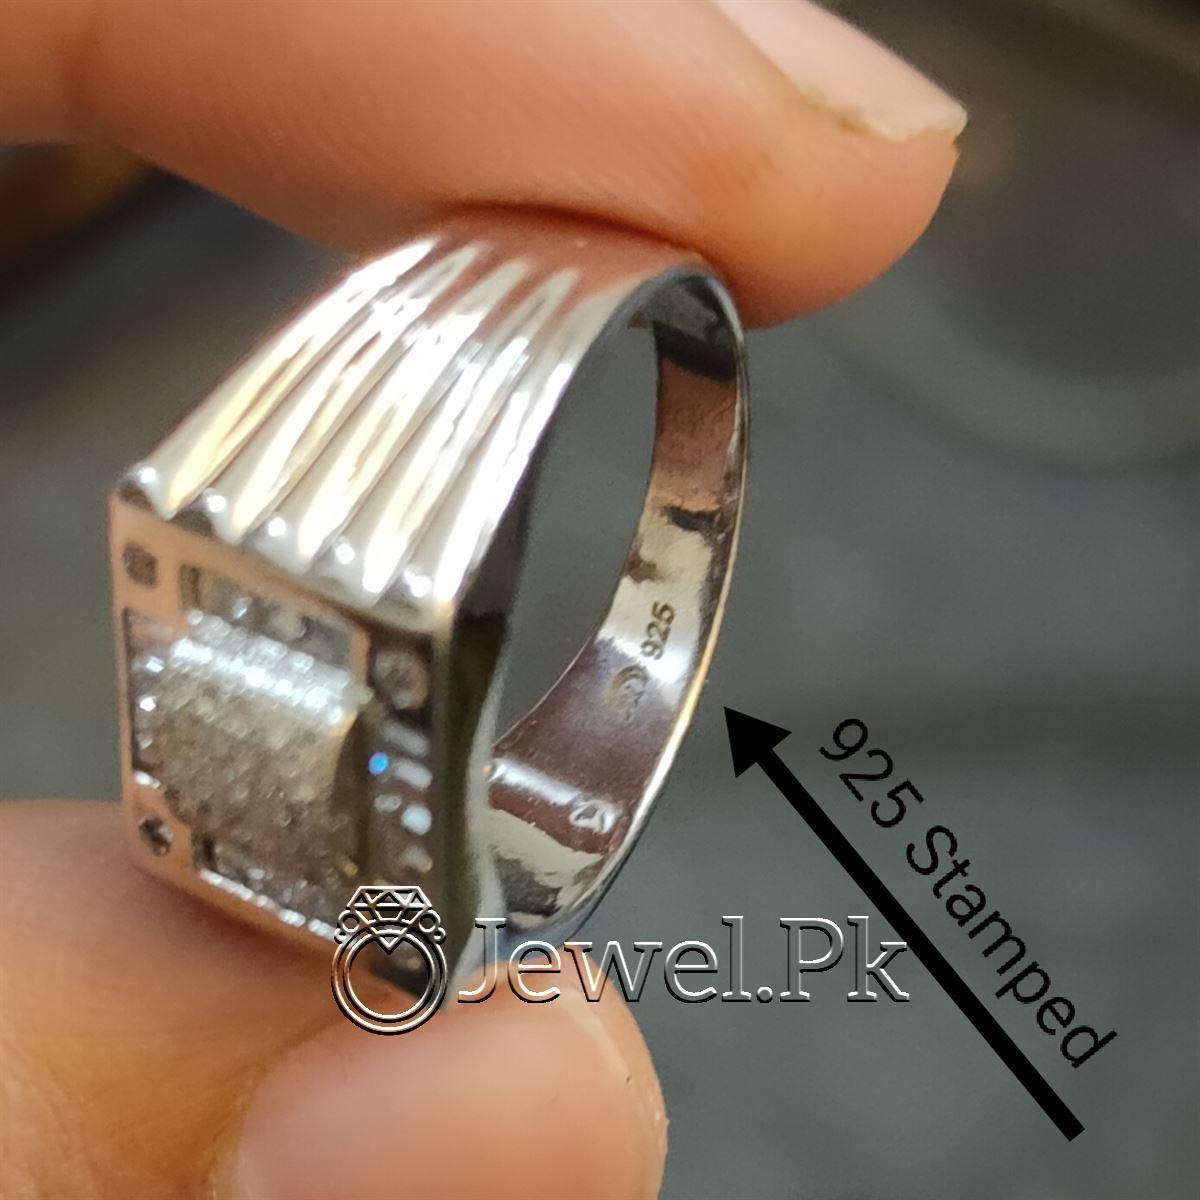 Luxury Italian Rings for men Very Beautiful Italian Zircon Rings for man 6 natural gemstones pakistan + 925 silver jewelry online